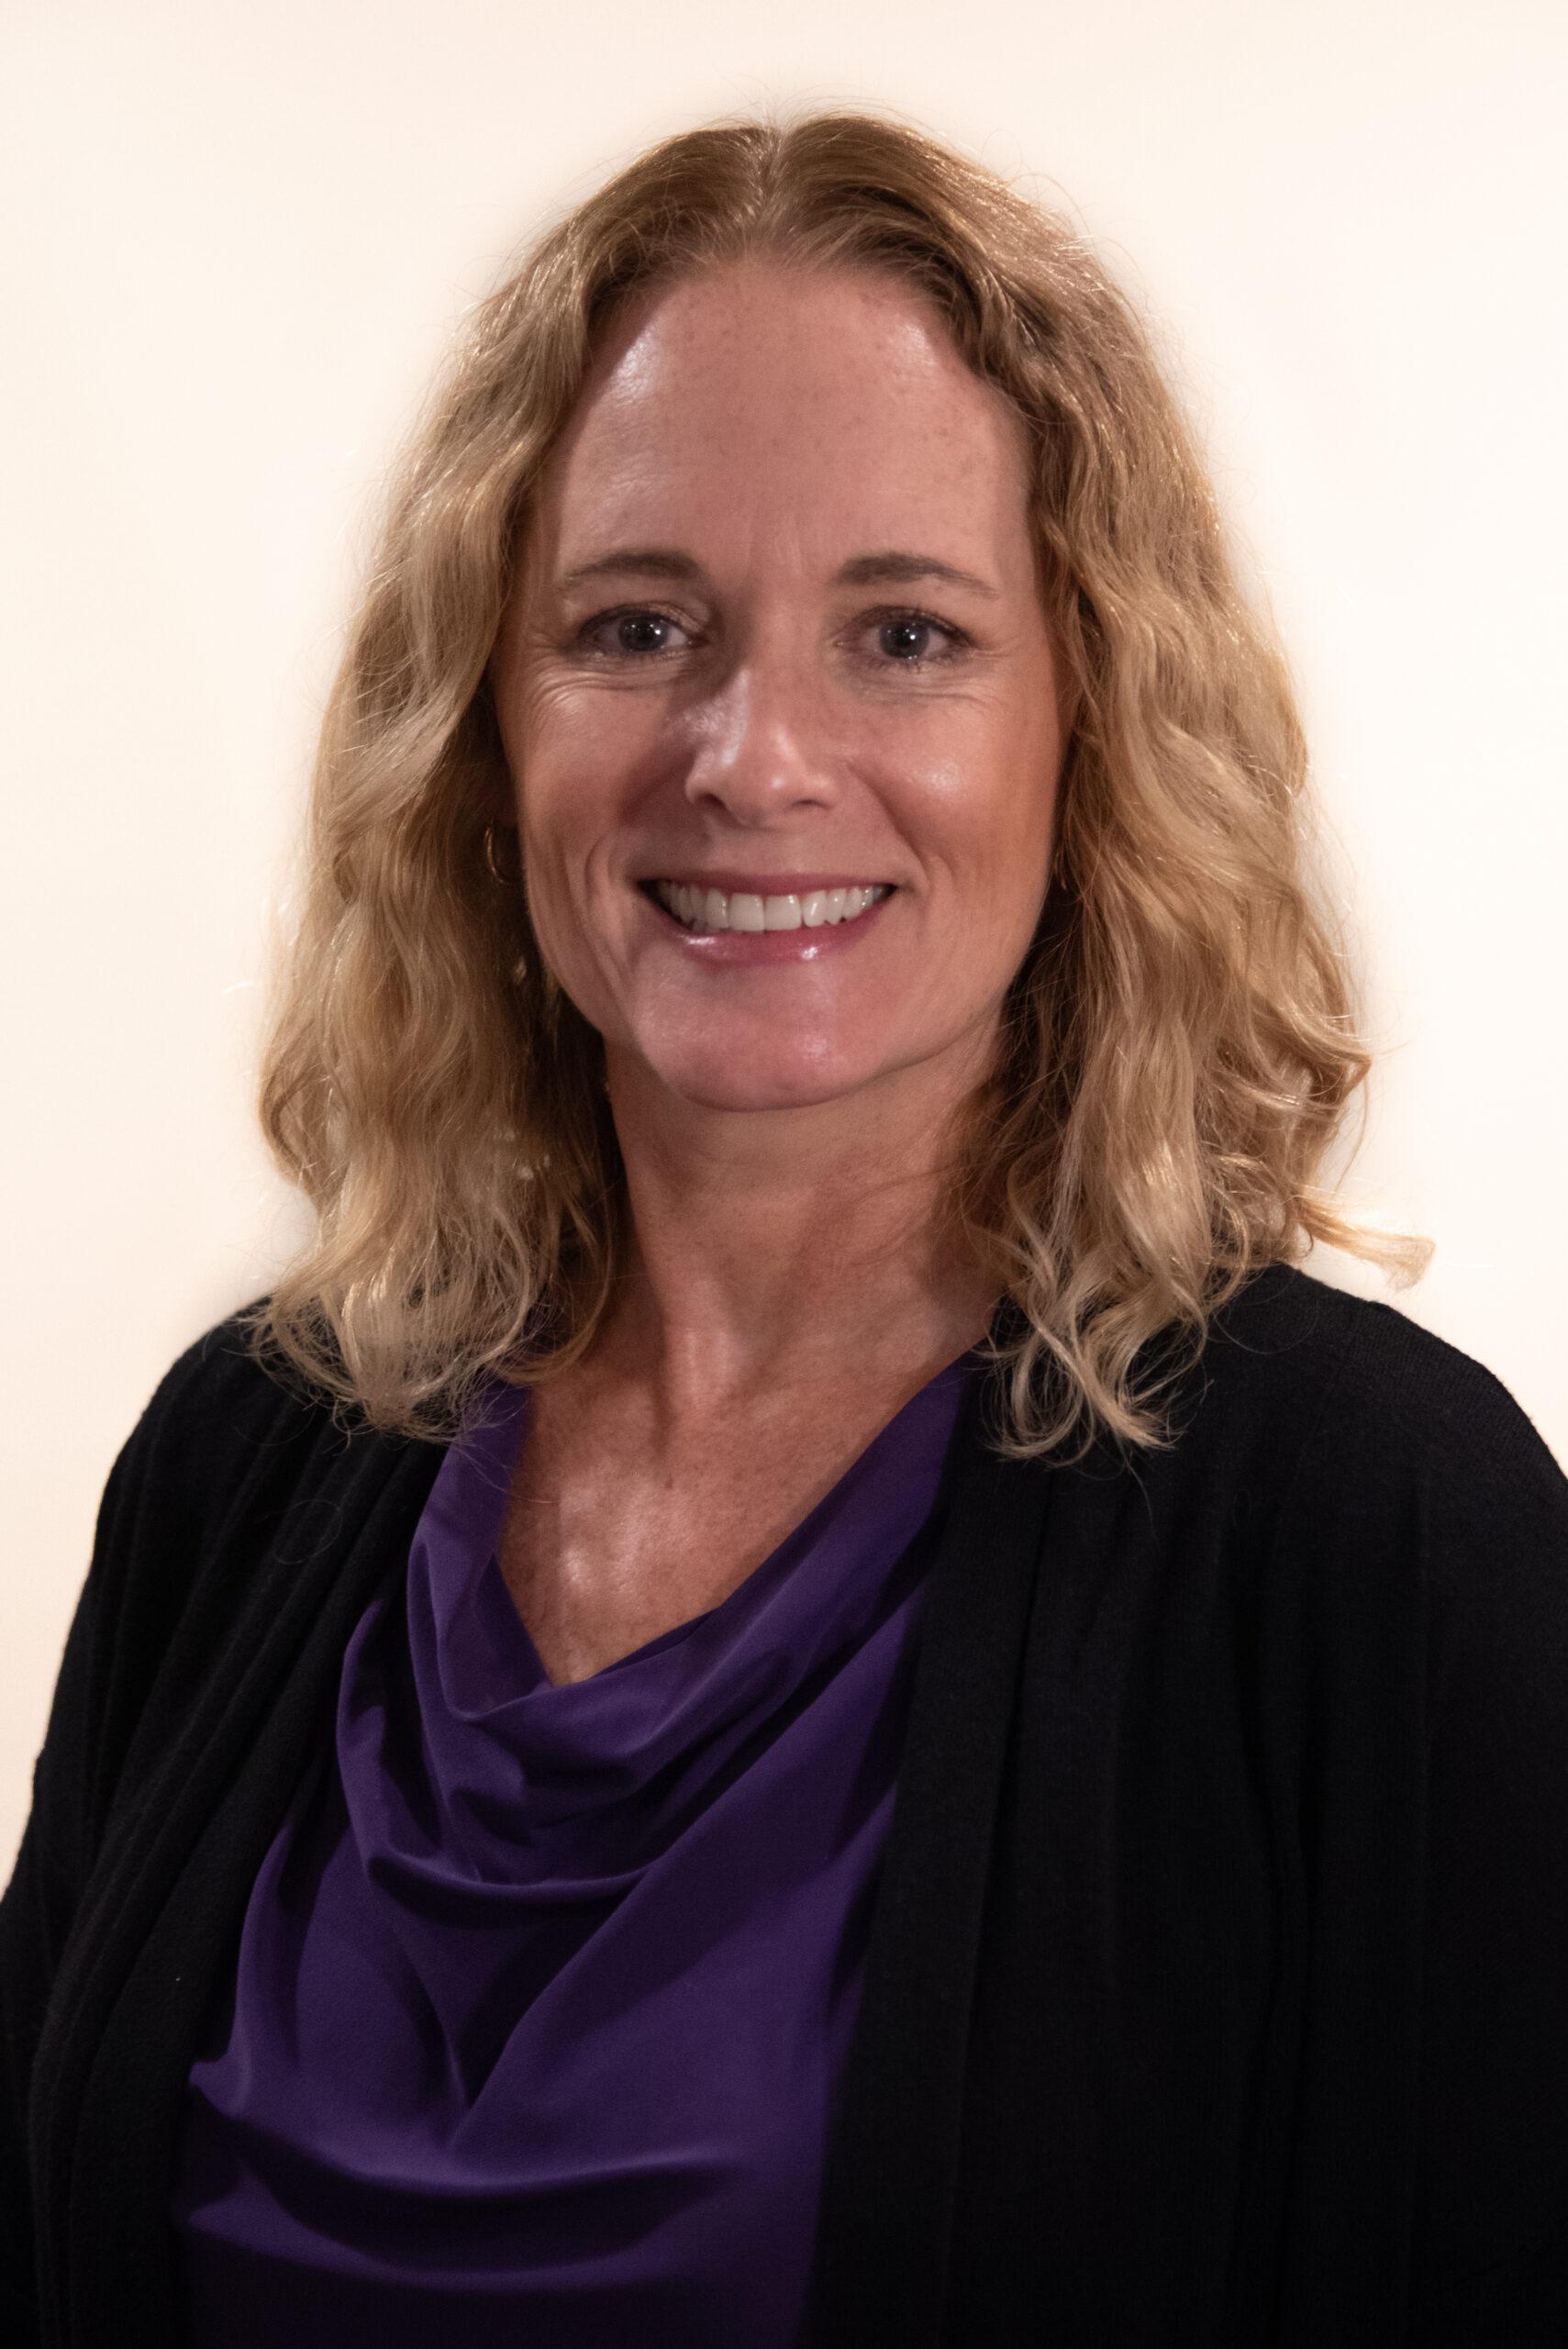 Ms. Sharon Solorzano